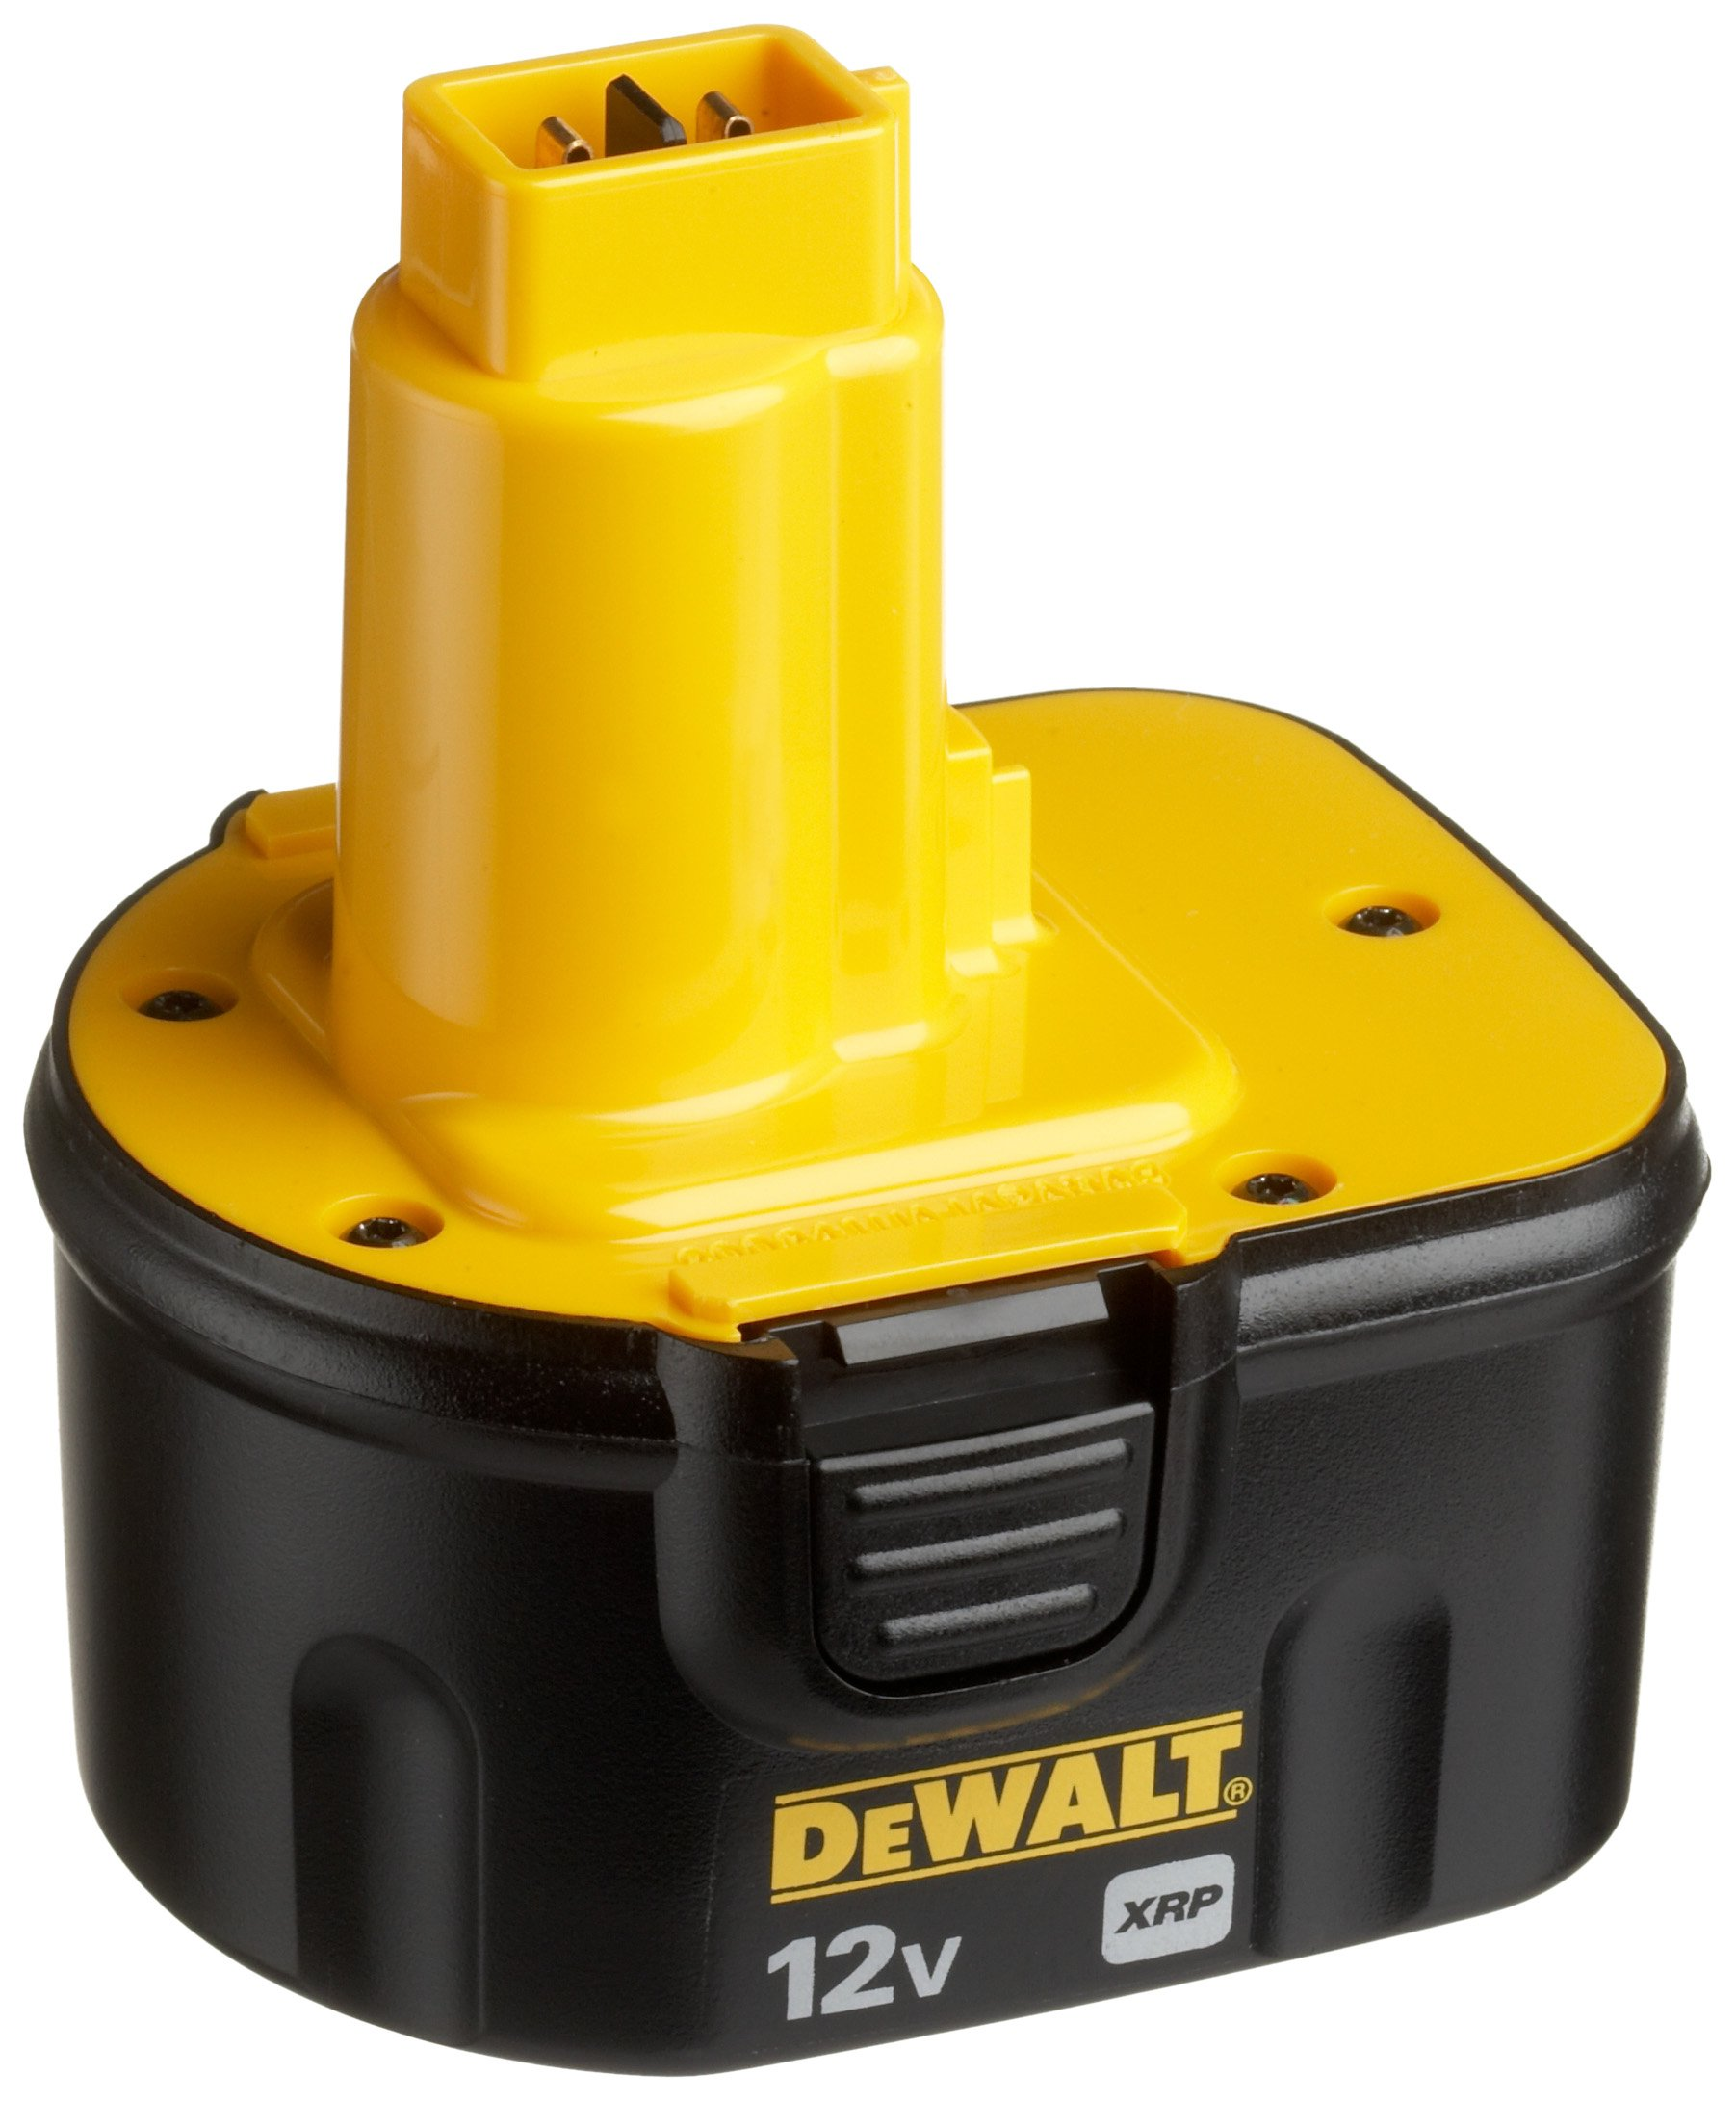 DEWALT DC9071 XRP 12-Volt 2.4 Amp Hour NiCd Battery by DEWALT (Image #1)